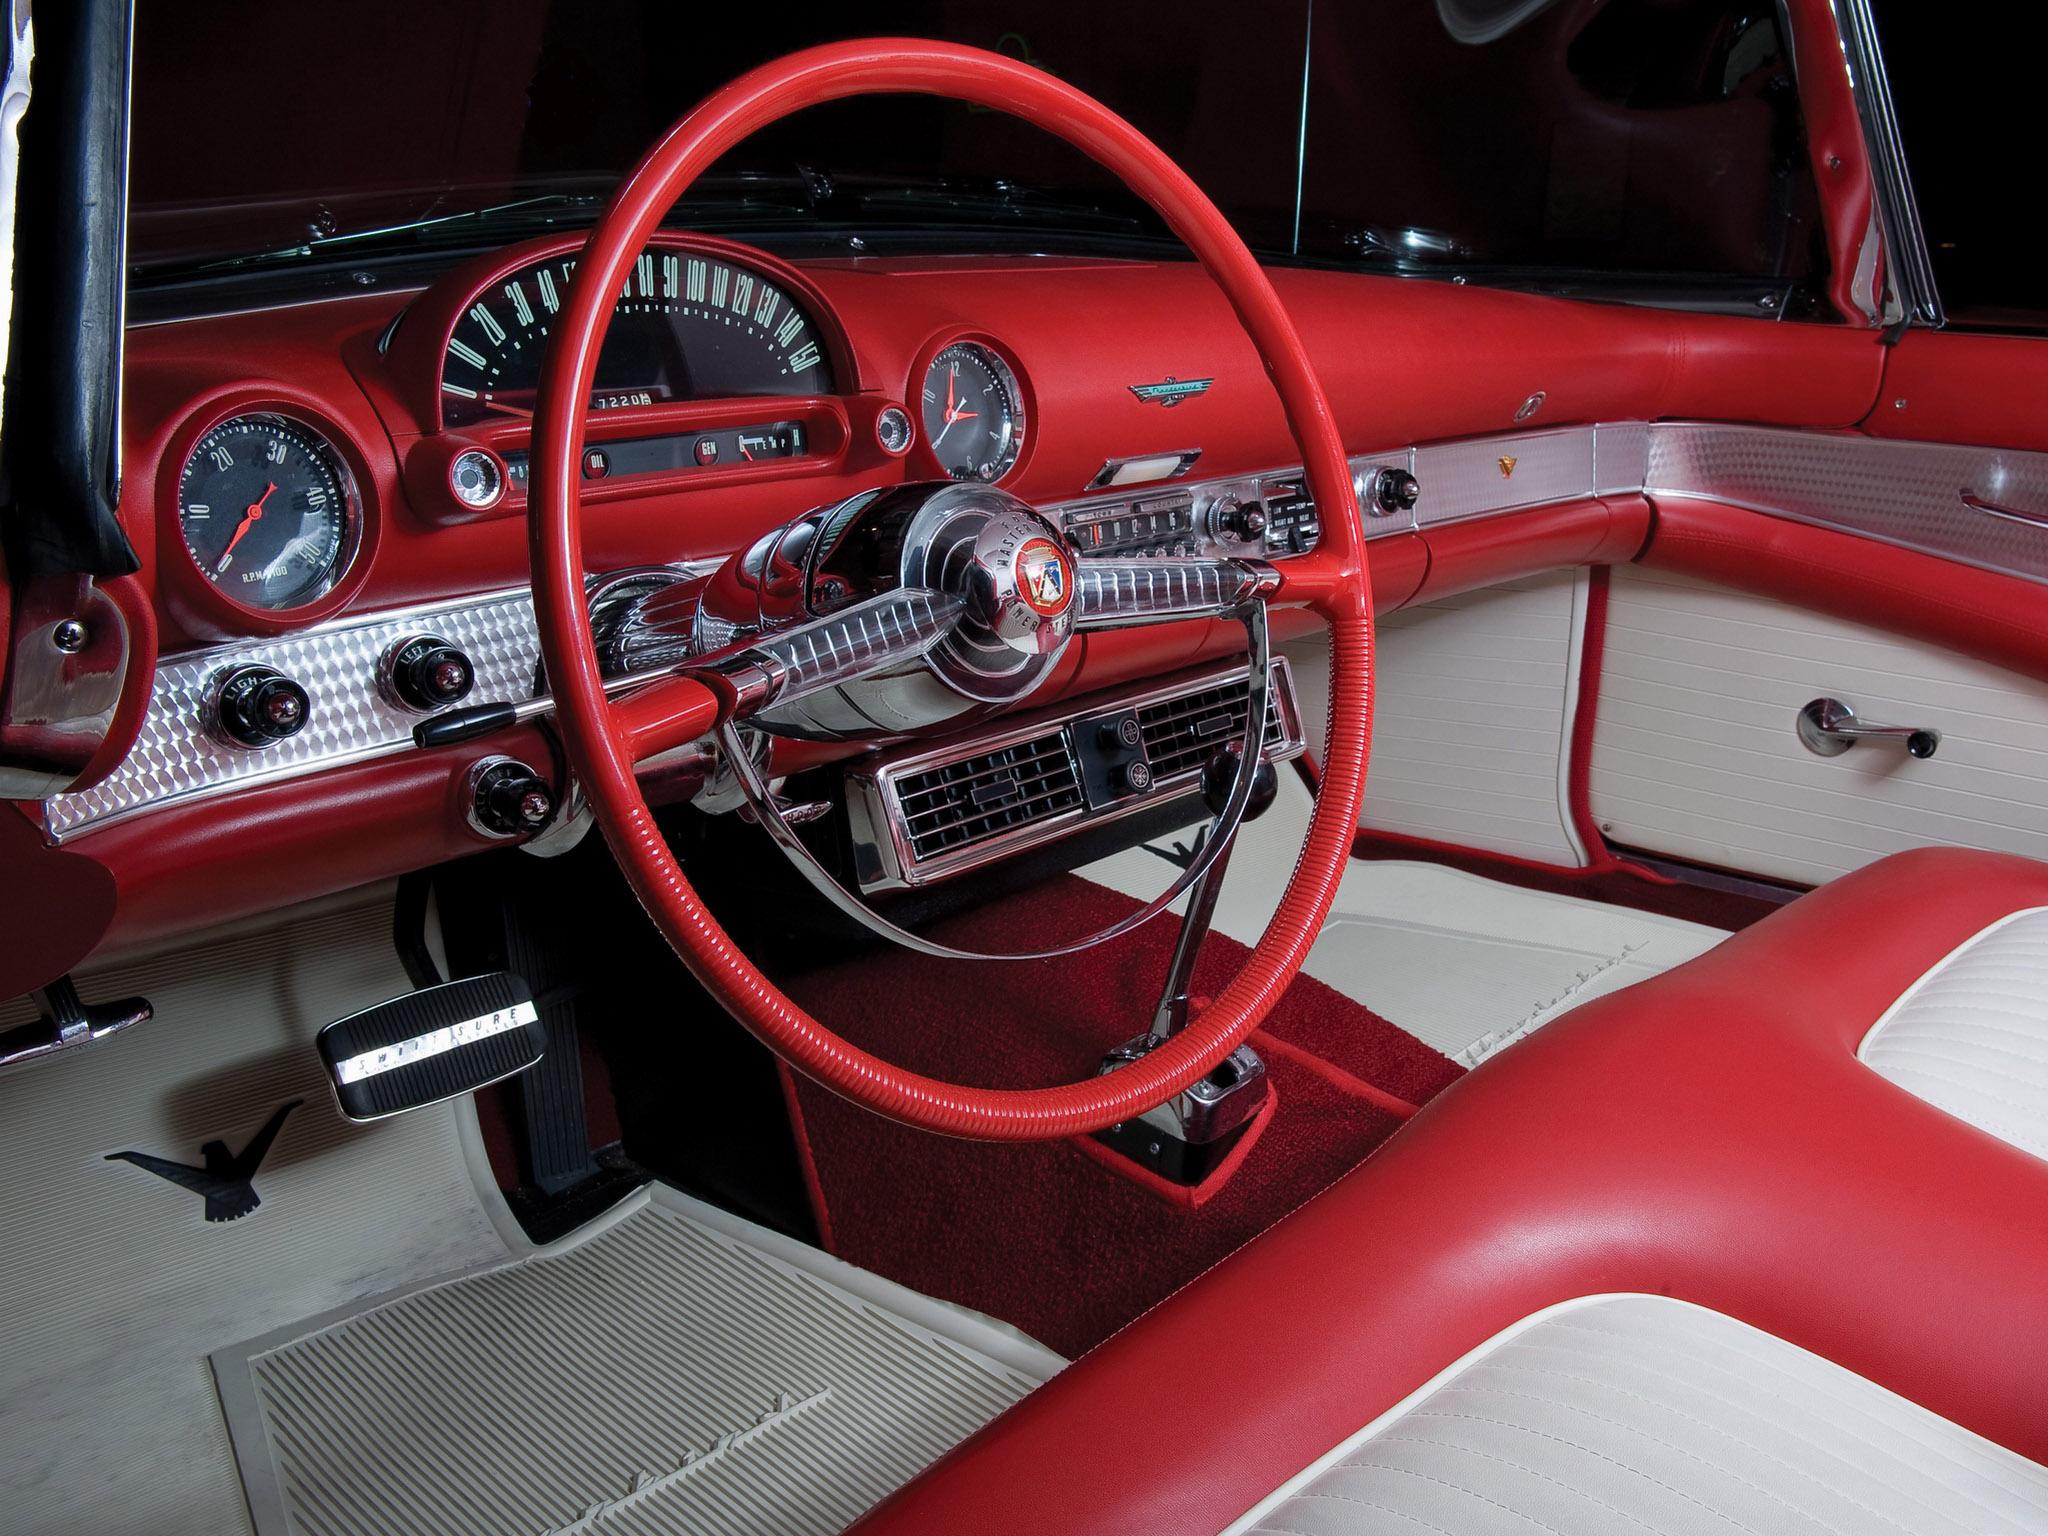 1955 ford thunderbird retro interior wallpaper 2048x1536 105507 wallpaperup